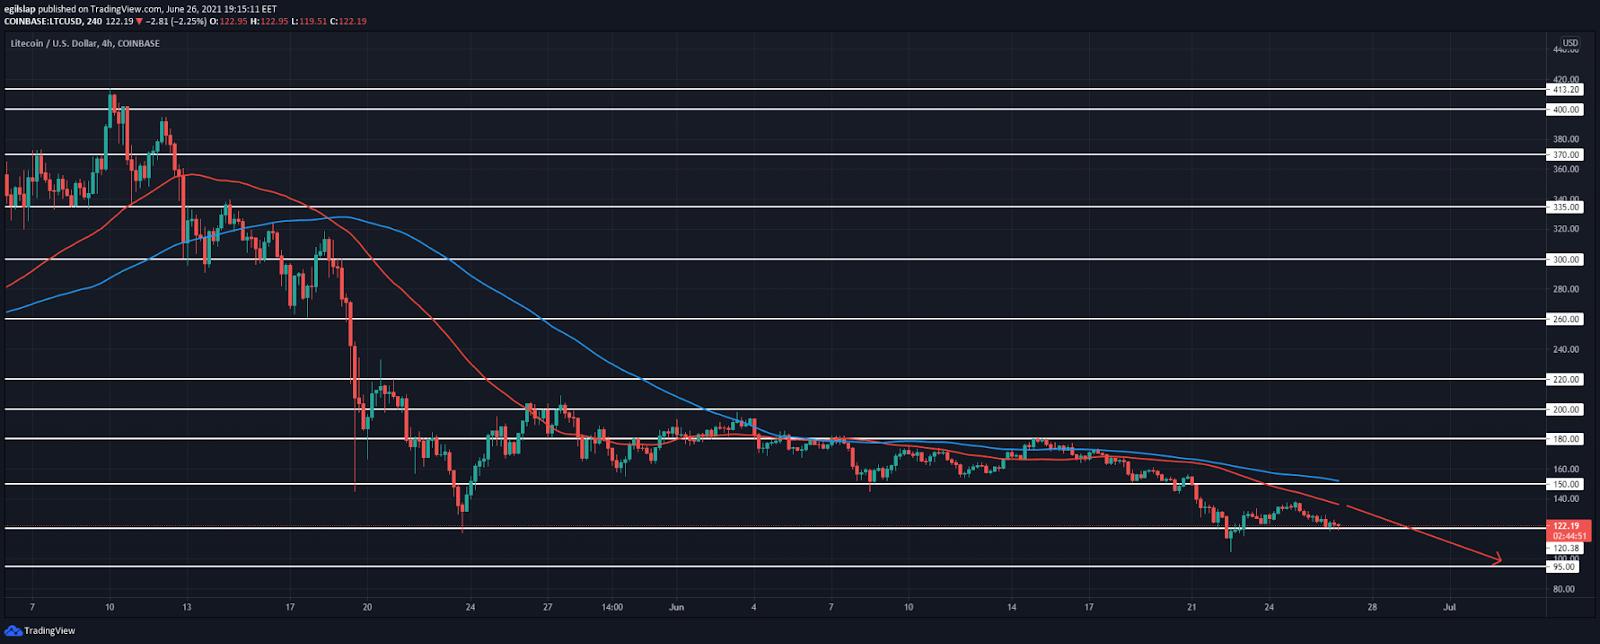 Litecoin price analysis: Litecoin slowly declines to $120, prepares to break lower? 2